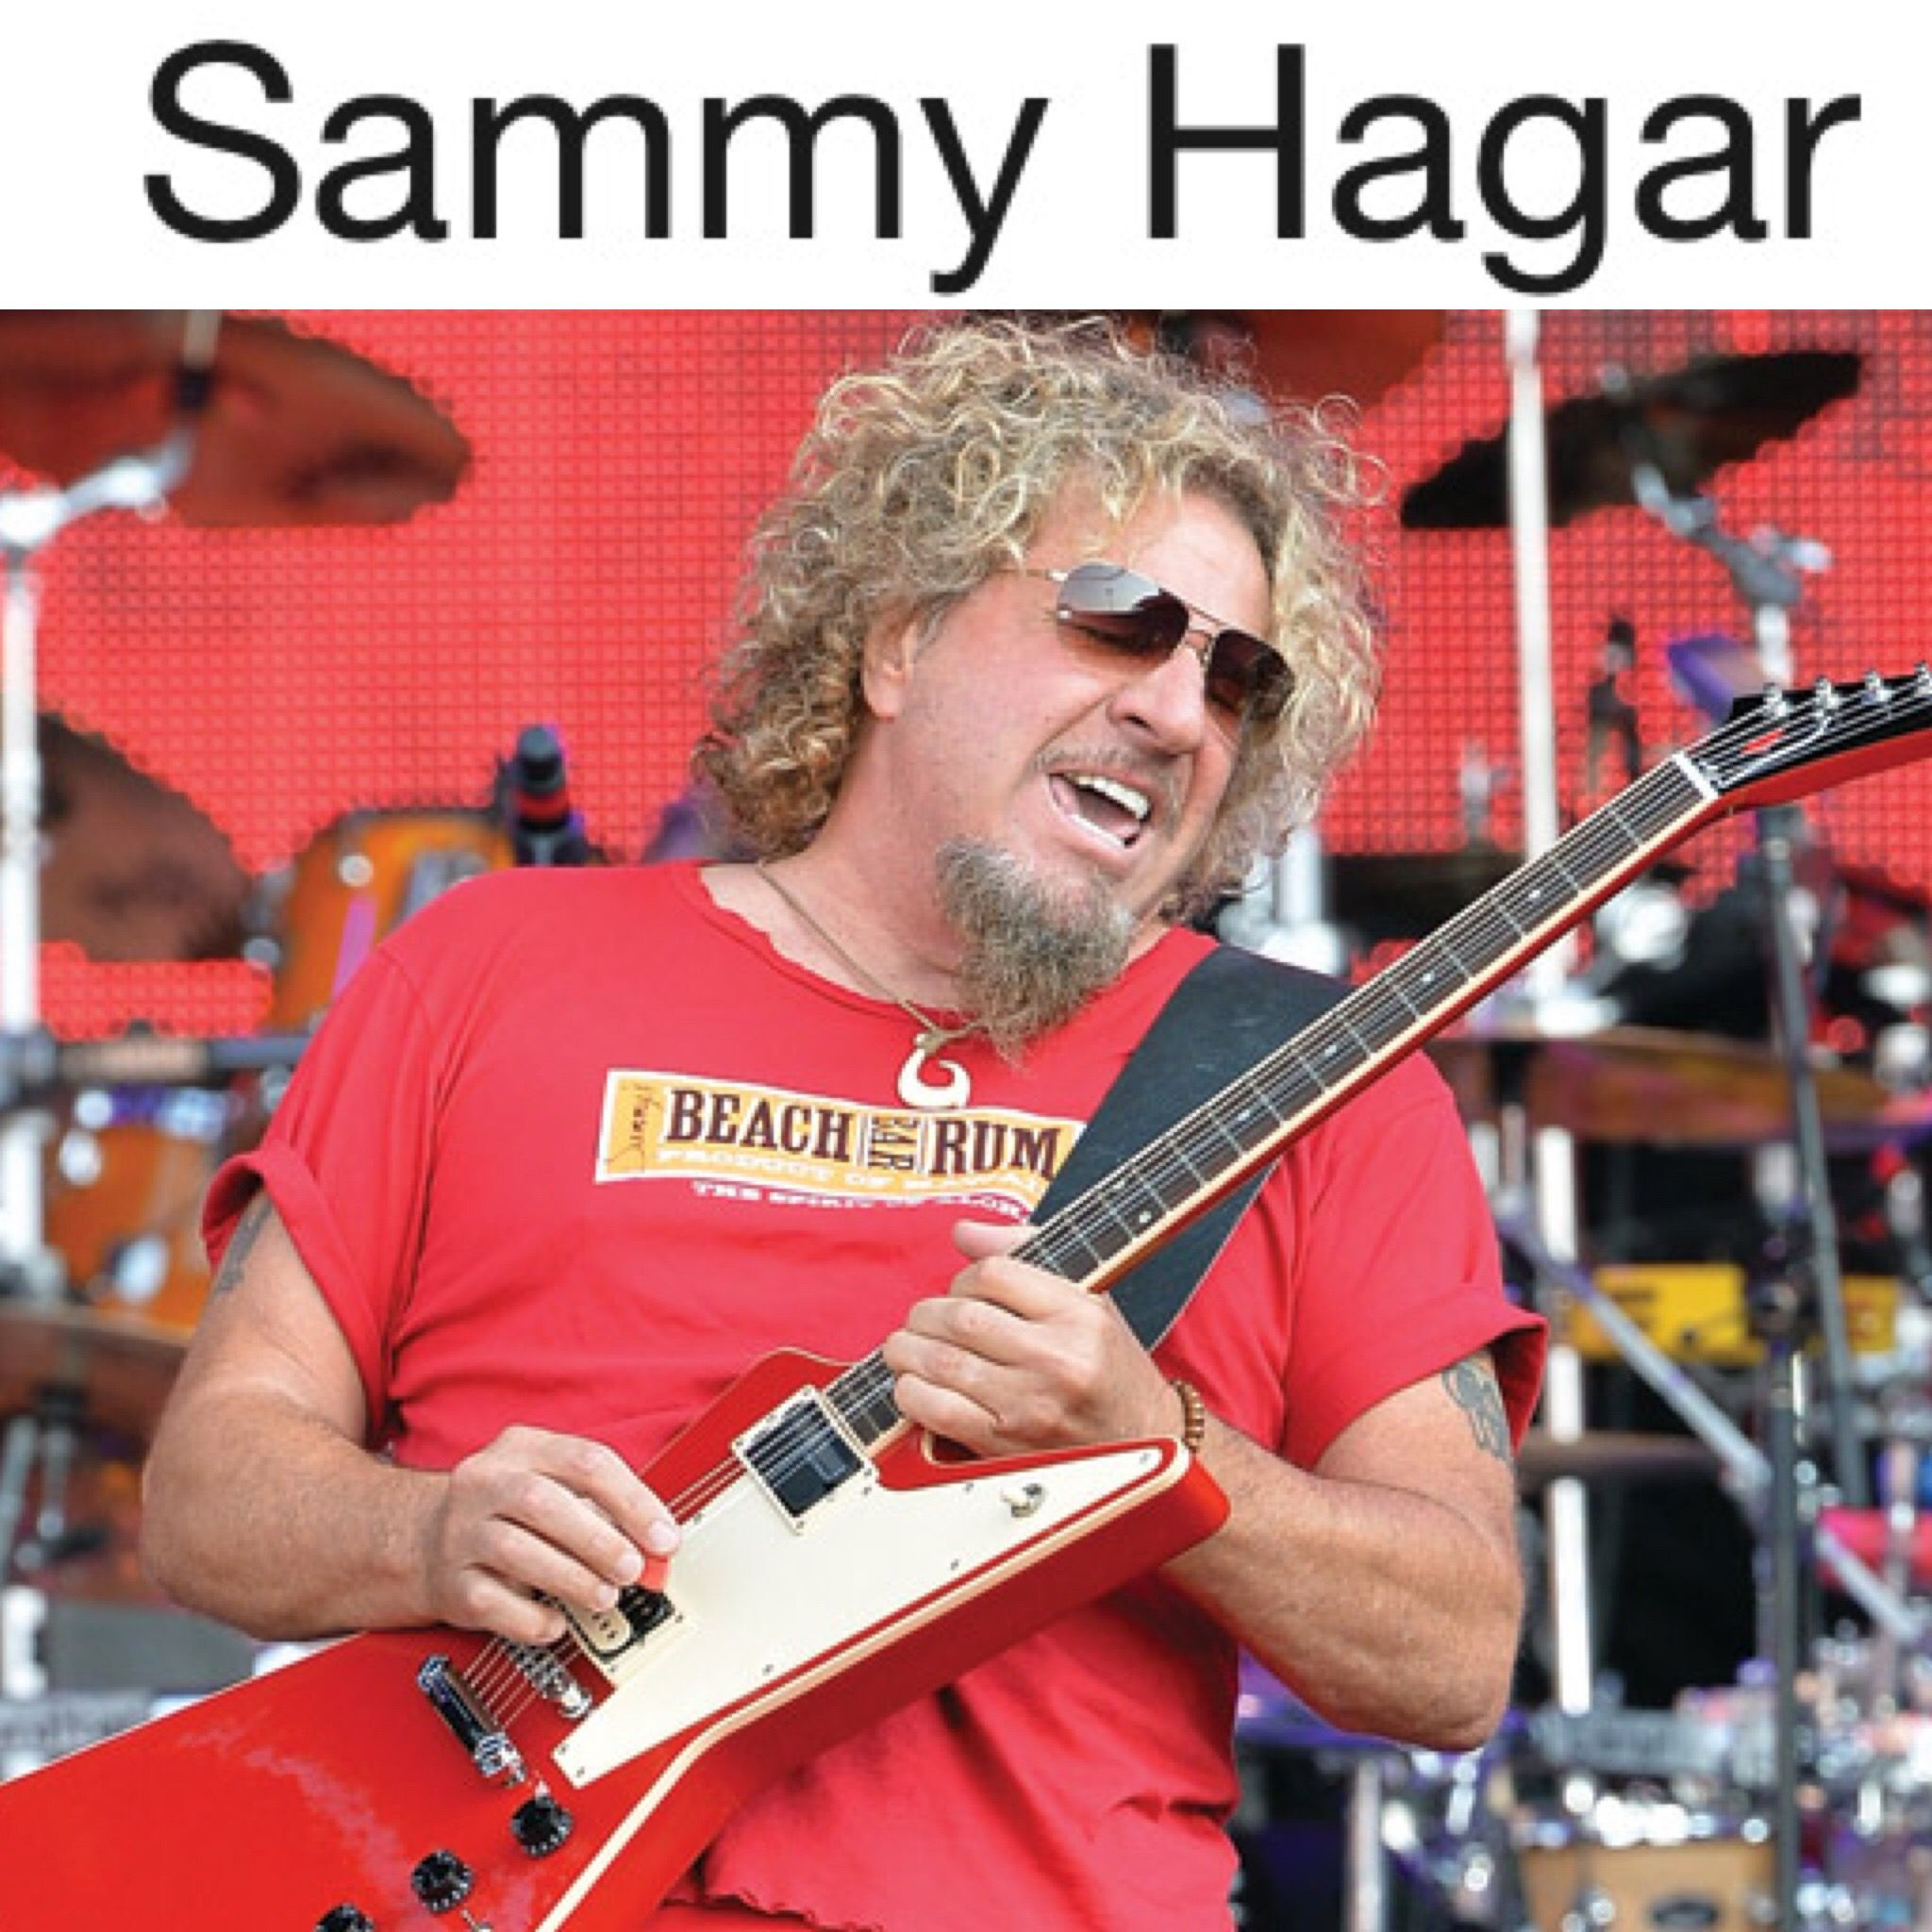 1947 Sammy Hagar Salinas California U S Sammyhagar L20097 Sammy Hagar Rock And Roll Rolled Poster